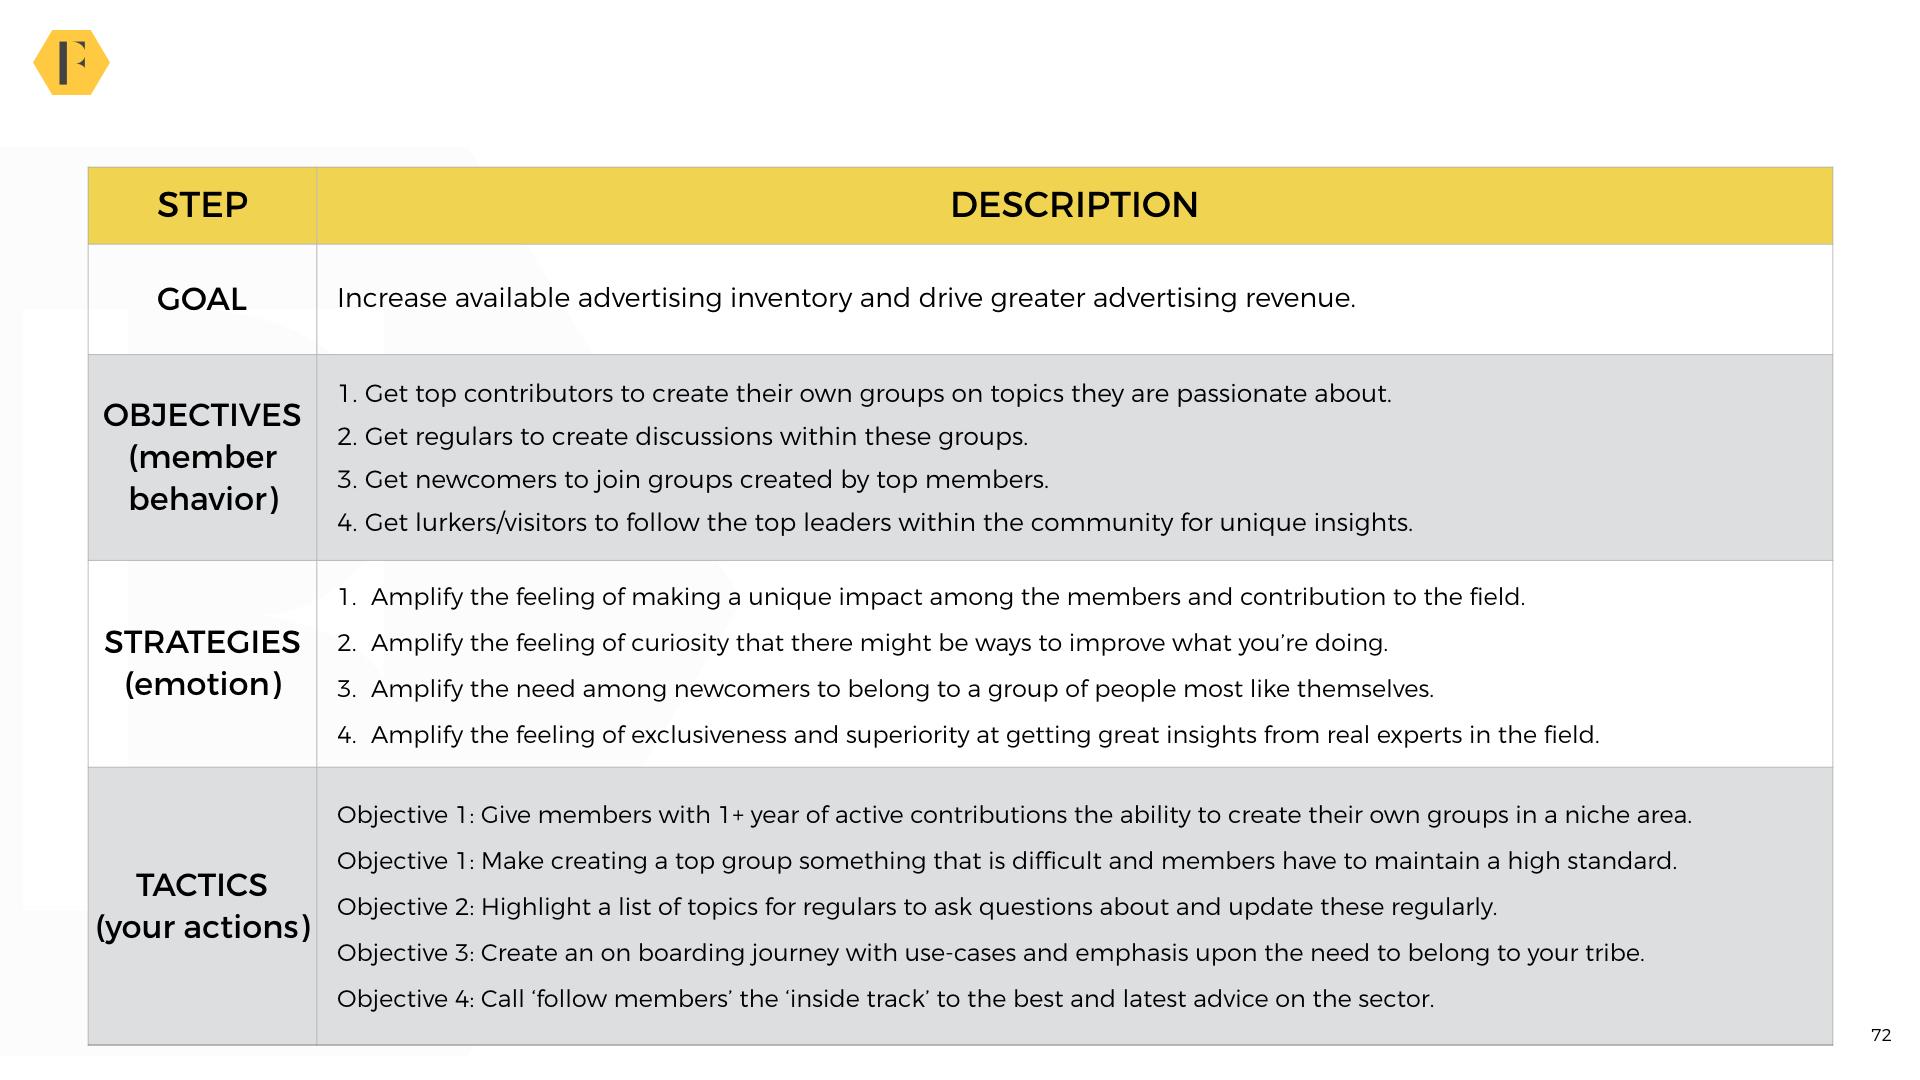 6 Strategic Plan Templates For Online Communities